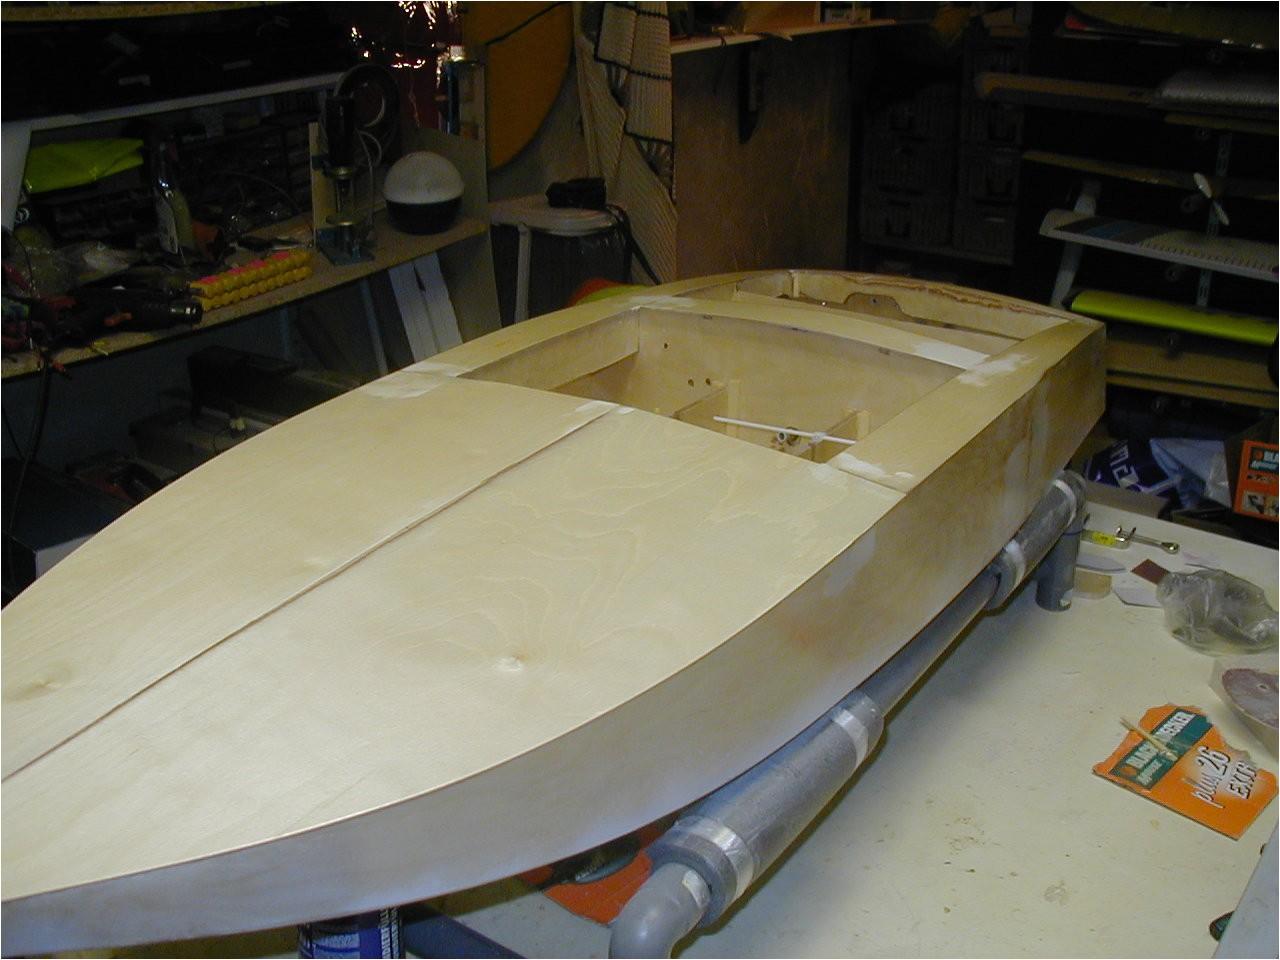 rc wood boat plans plans diy free download 8 x 10 building plans